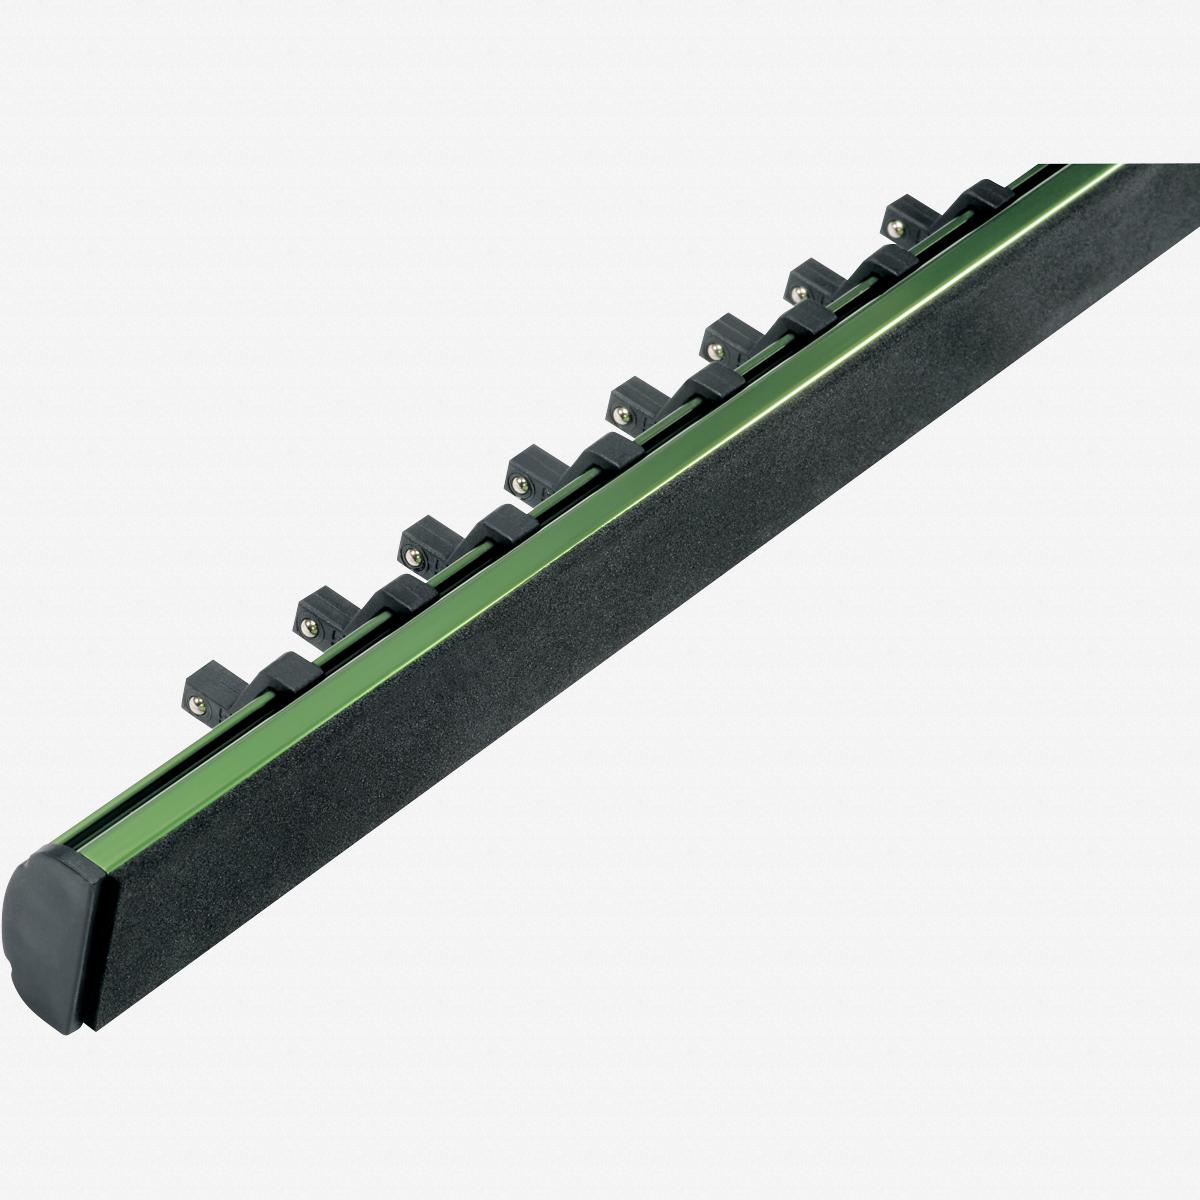 "Heyco 0507900 Metric Socket Set on Aluminum Rail - 1/2"" Drive - KC Tool"